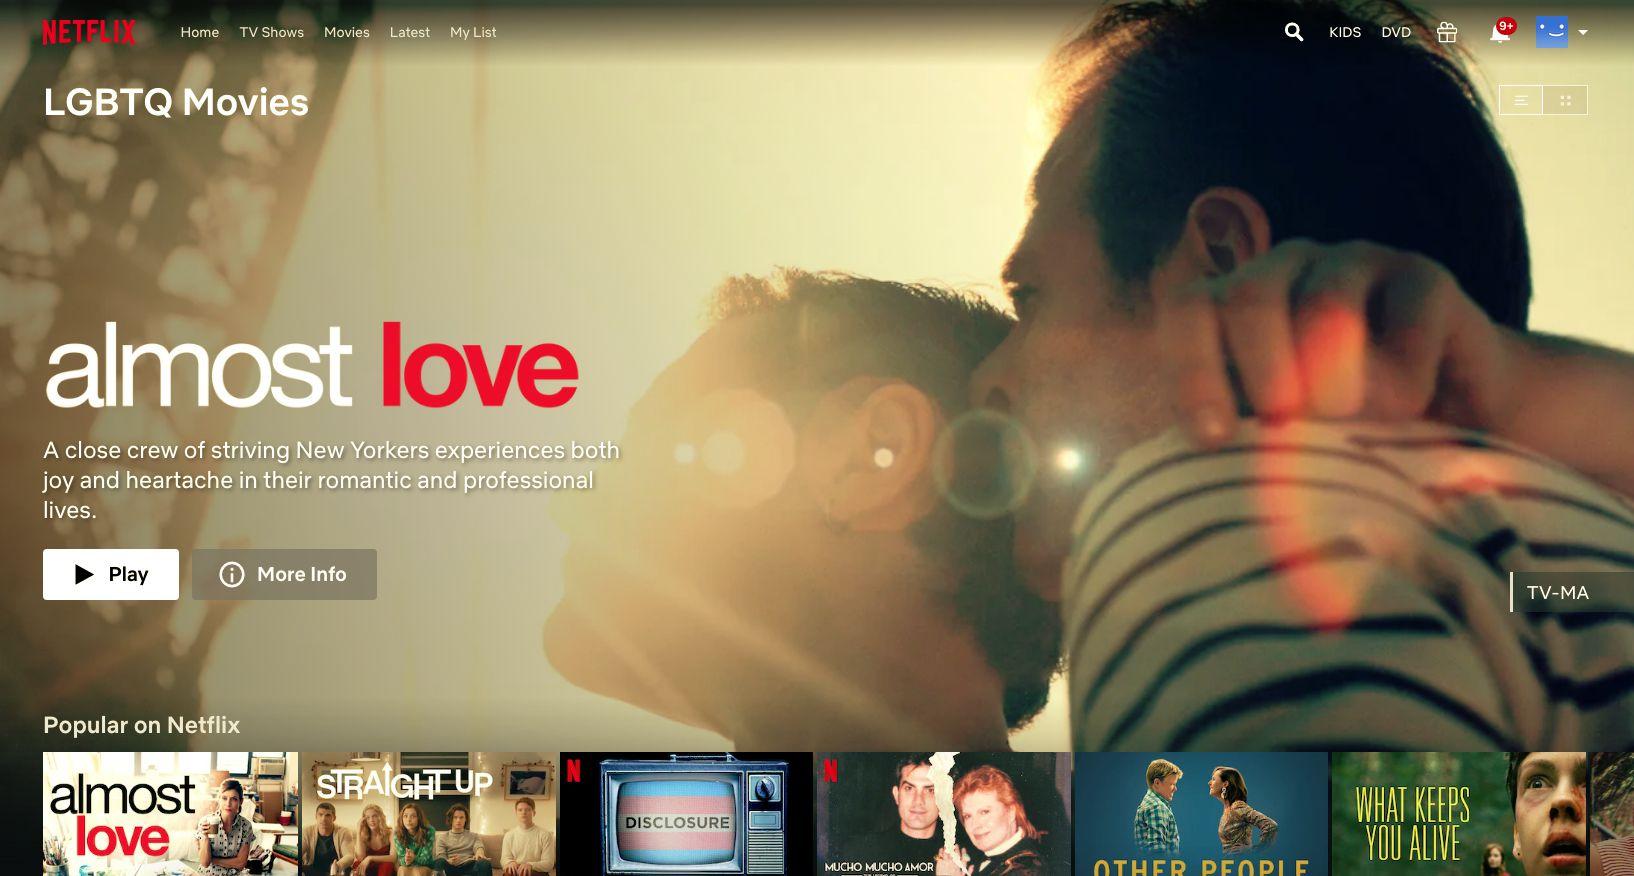 LGBTQ movies unlocked with Netflix hidden codes